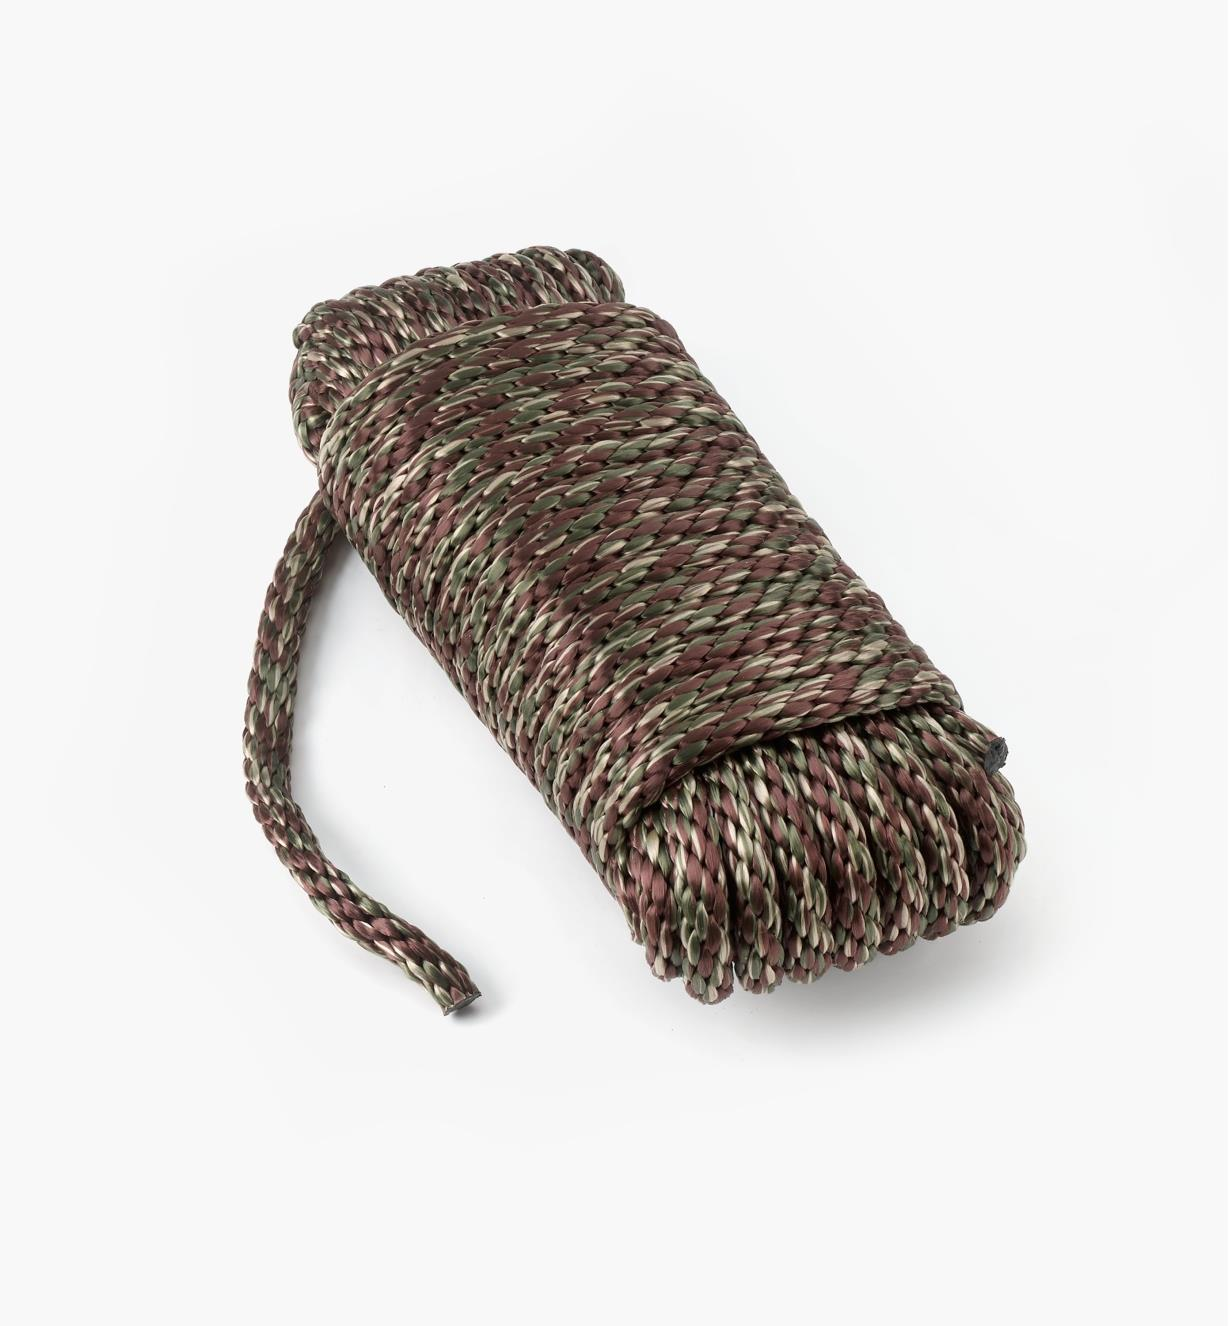 99W8766 - Polypropylene Rope, 50'